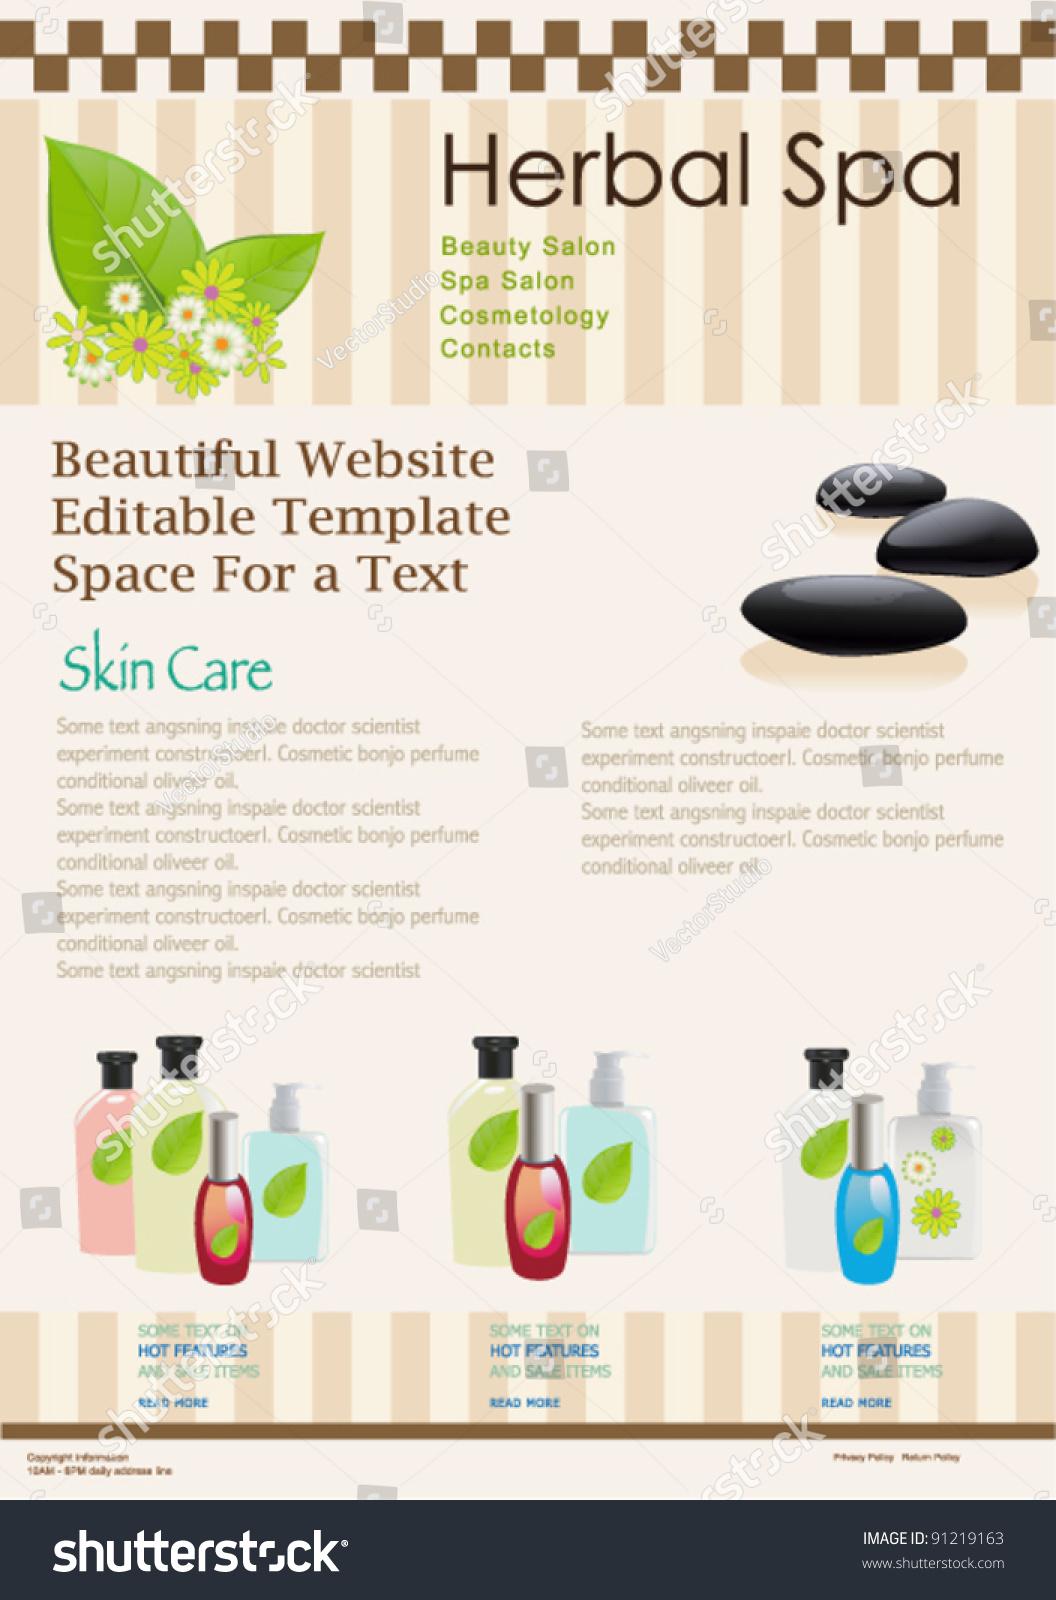 salon brochure templates free - website template for spa or beauty salon vector brochure